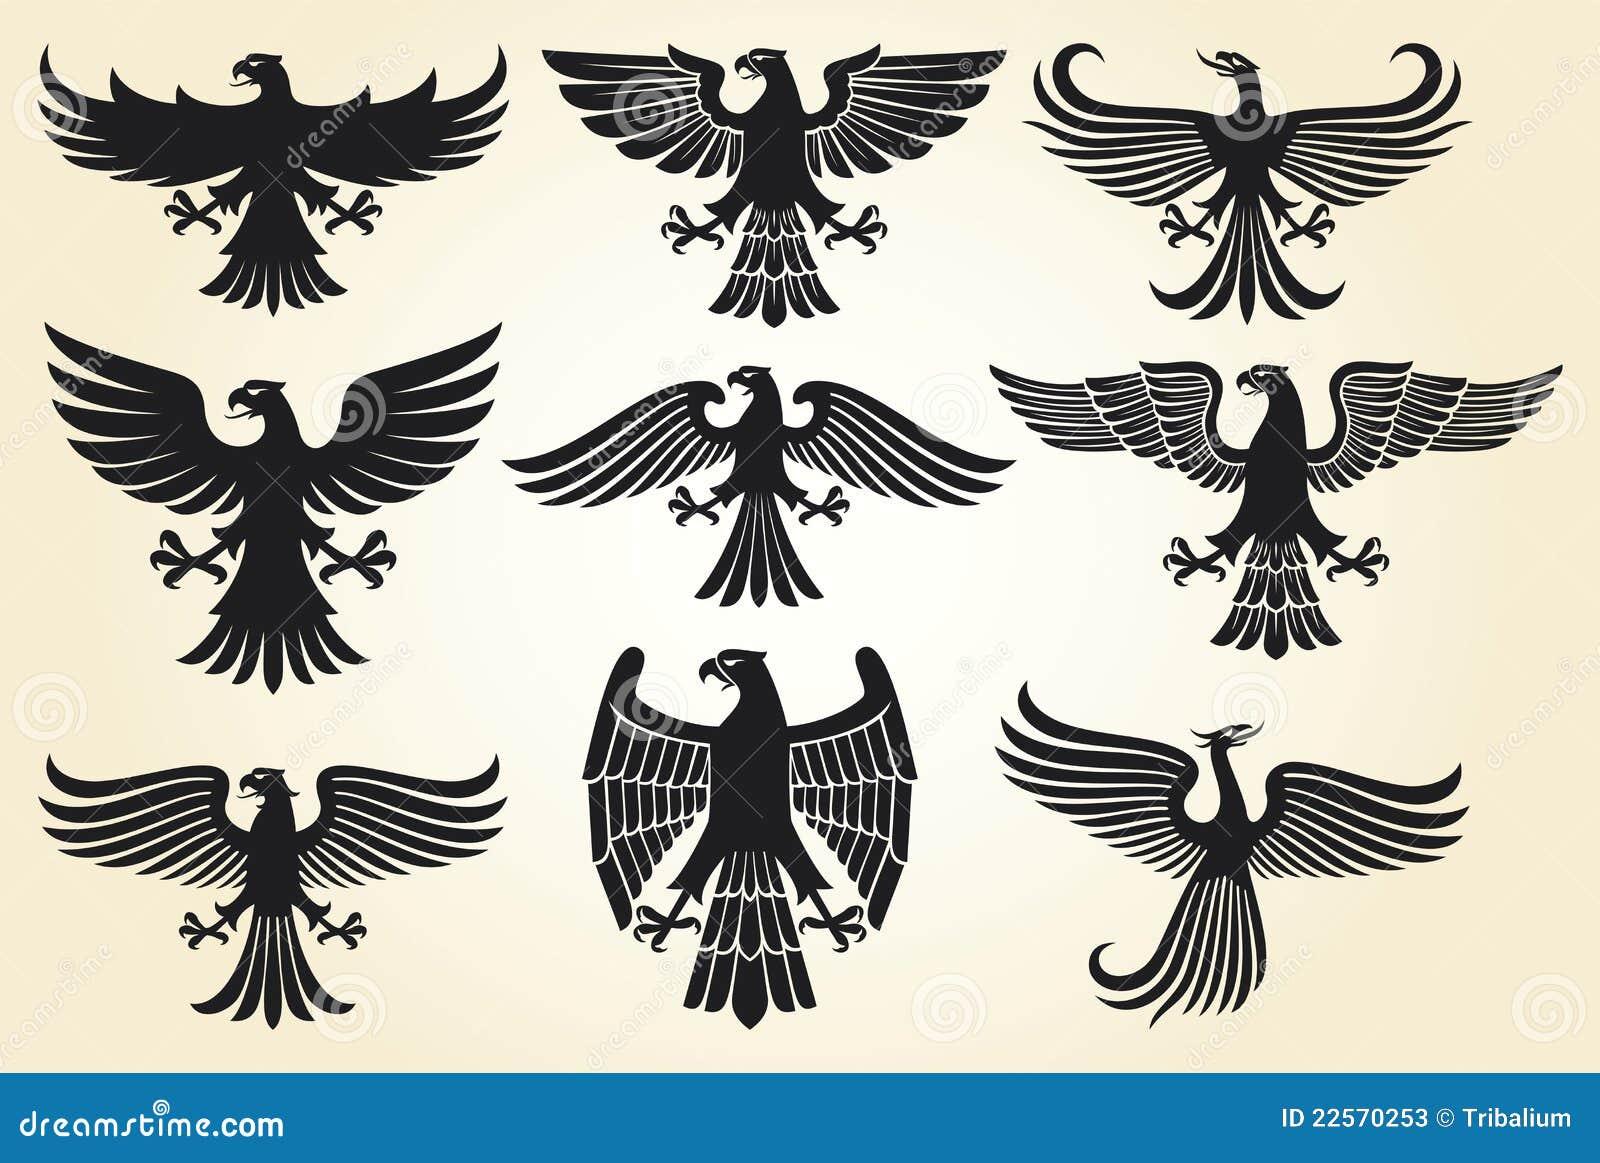 Heraldic Eagle Set Stock Photos - Image: 22570253